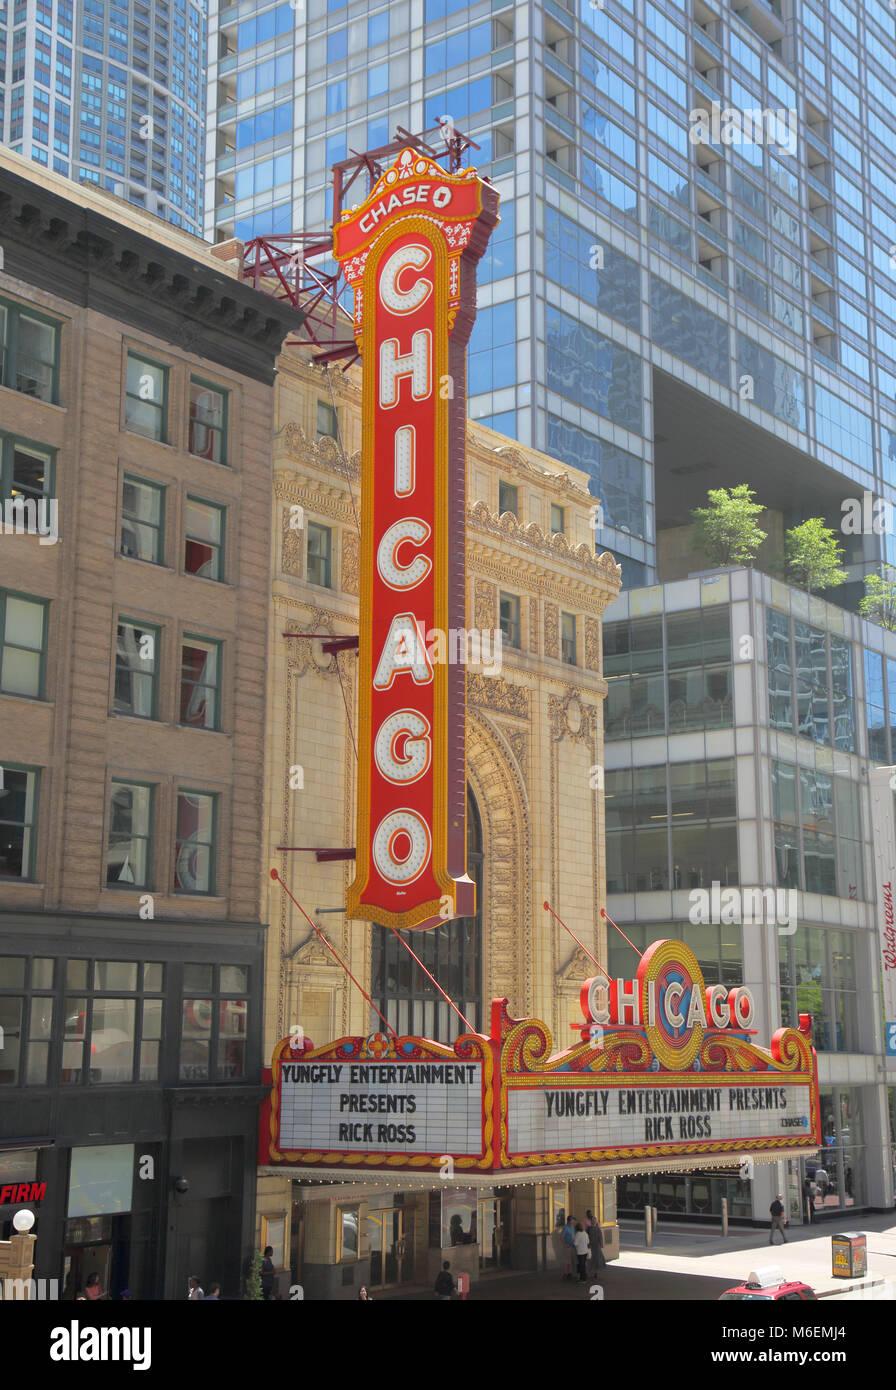 chicago theatre illinois - Stock Image